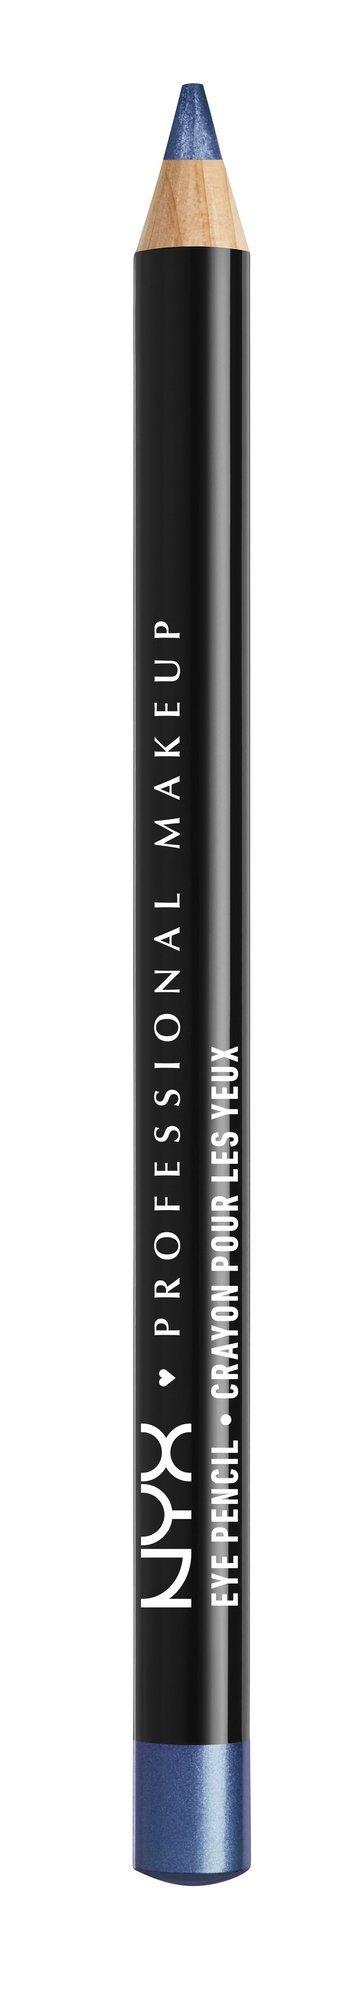 NYX Cosmetics Slim Eye Pencil Sapphire